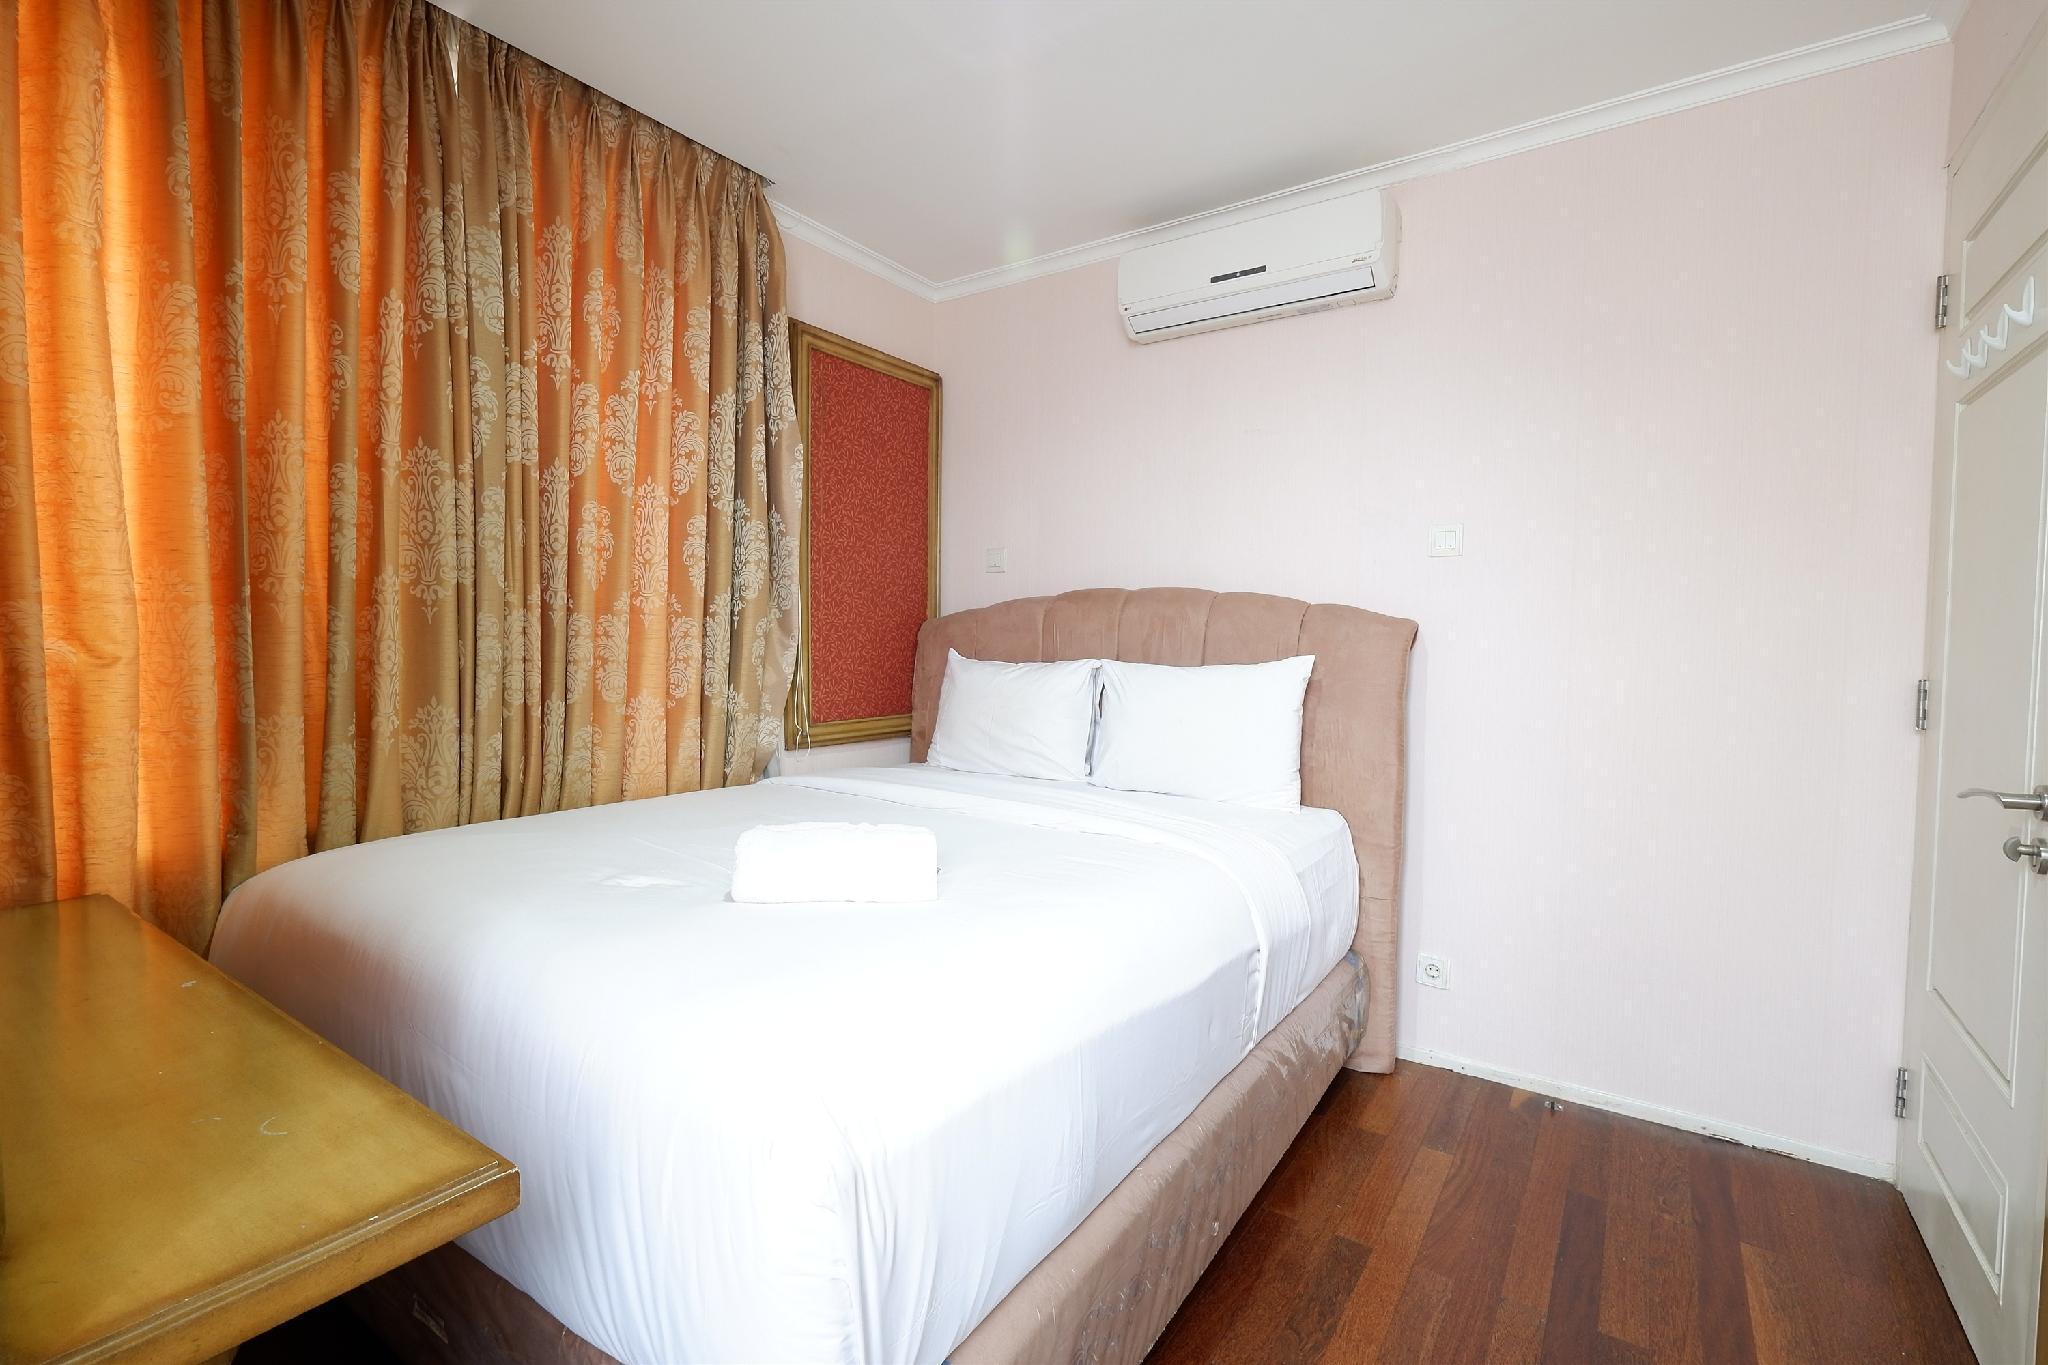 Premium Location 2BR Apt @FX Residence By Travelio